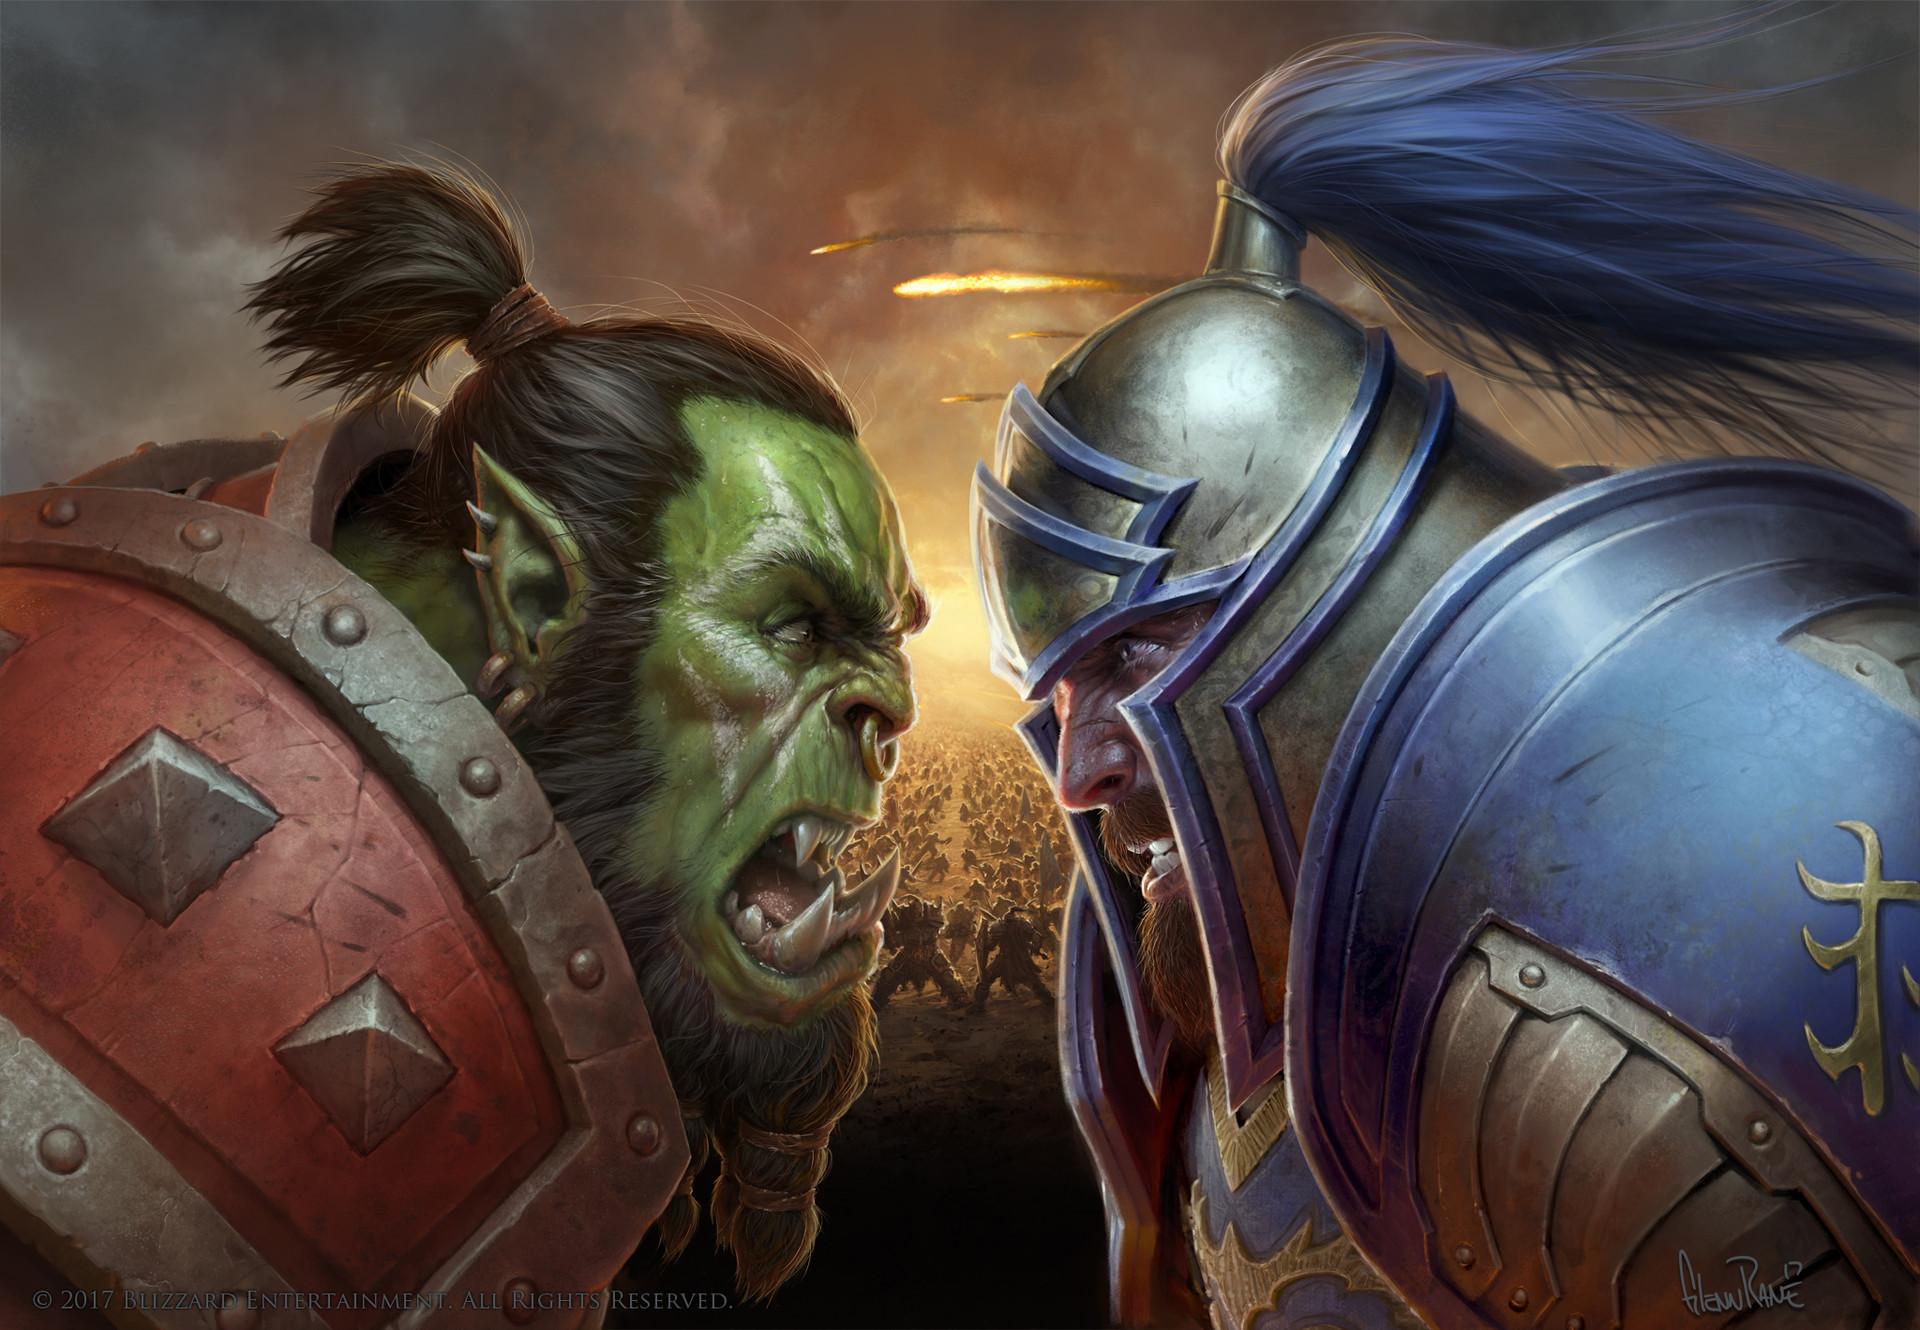 World Of Warcraft Bfa Wallpaper: World Of Warcraft: Battle For Azeroth, Glenn Rane